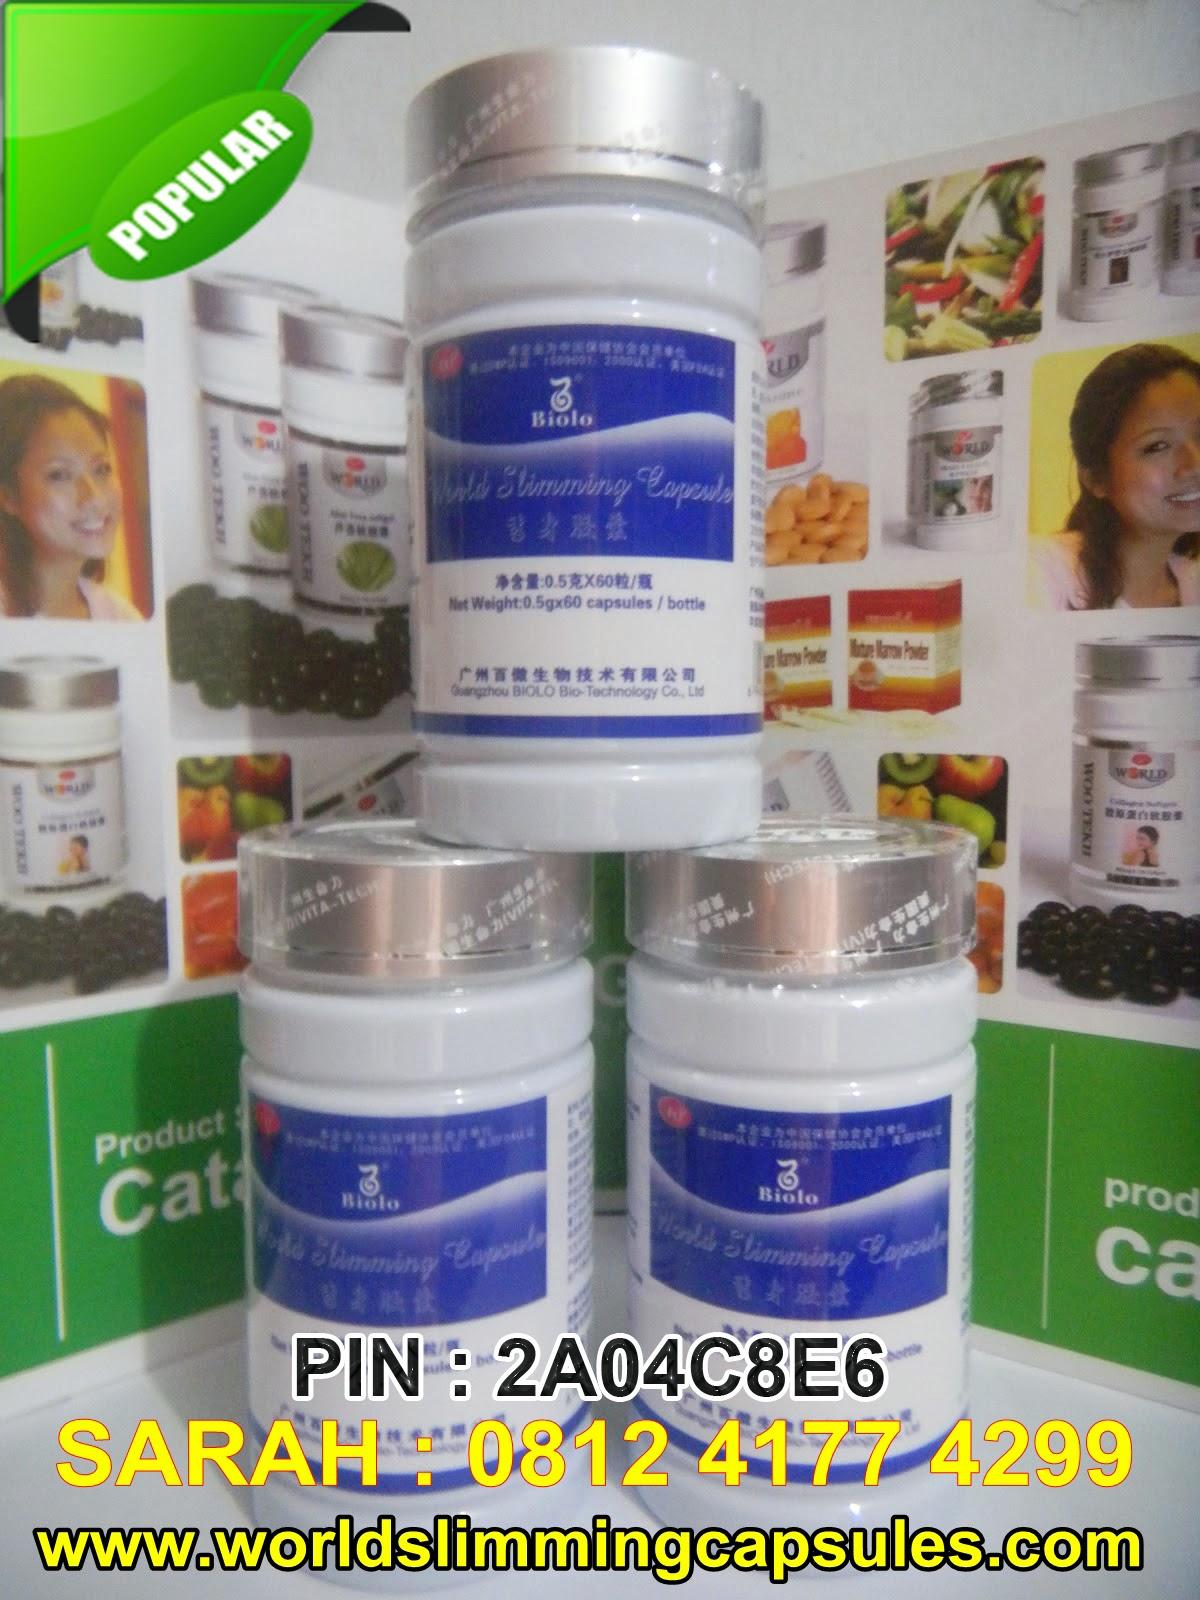 Biolo Slimming Capsules